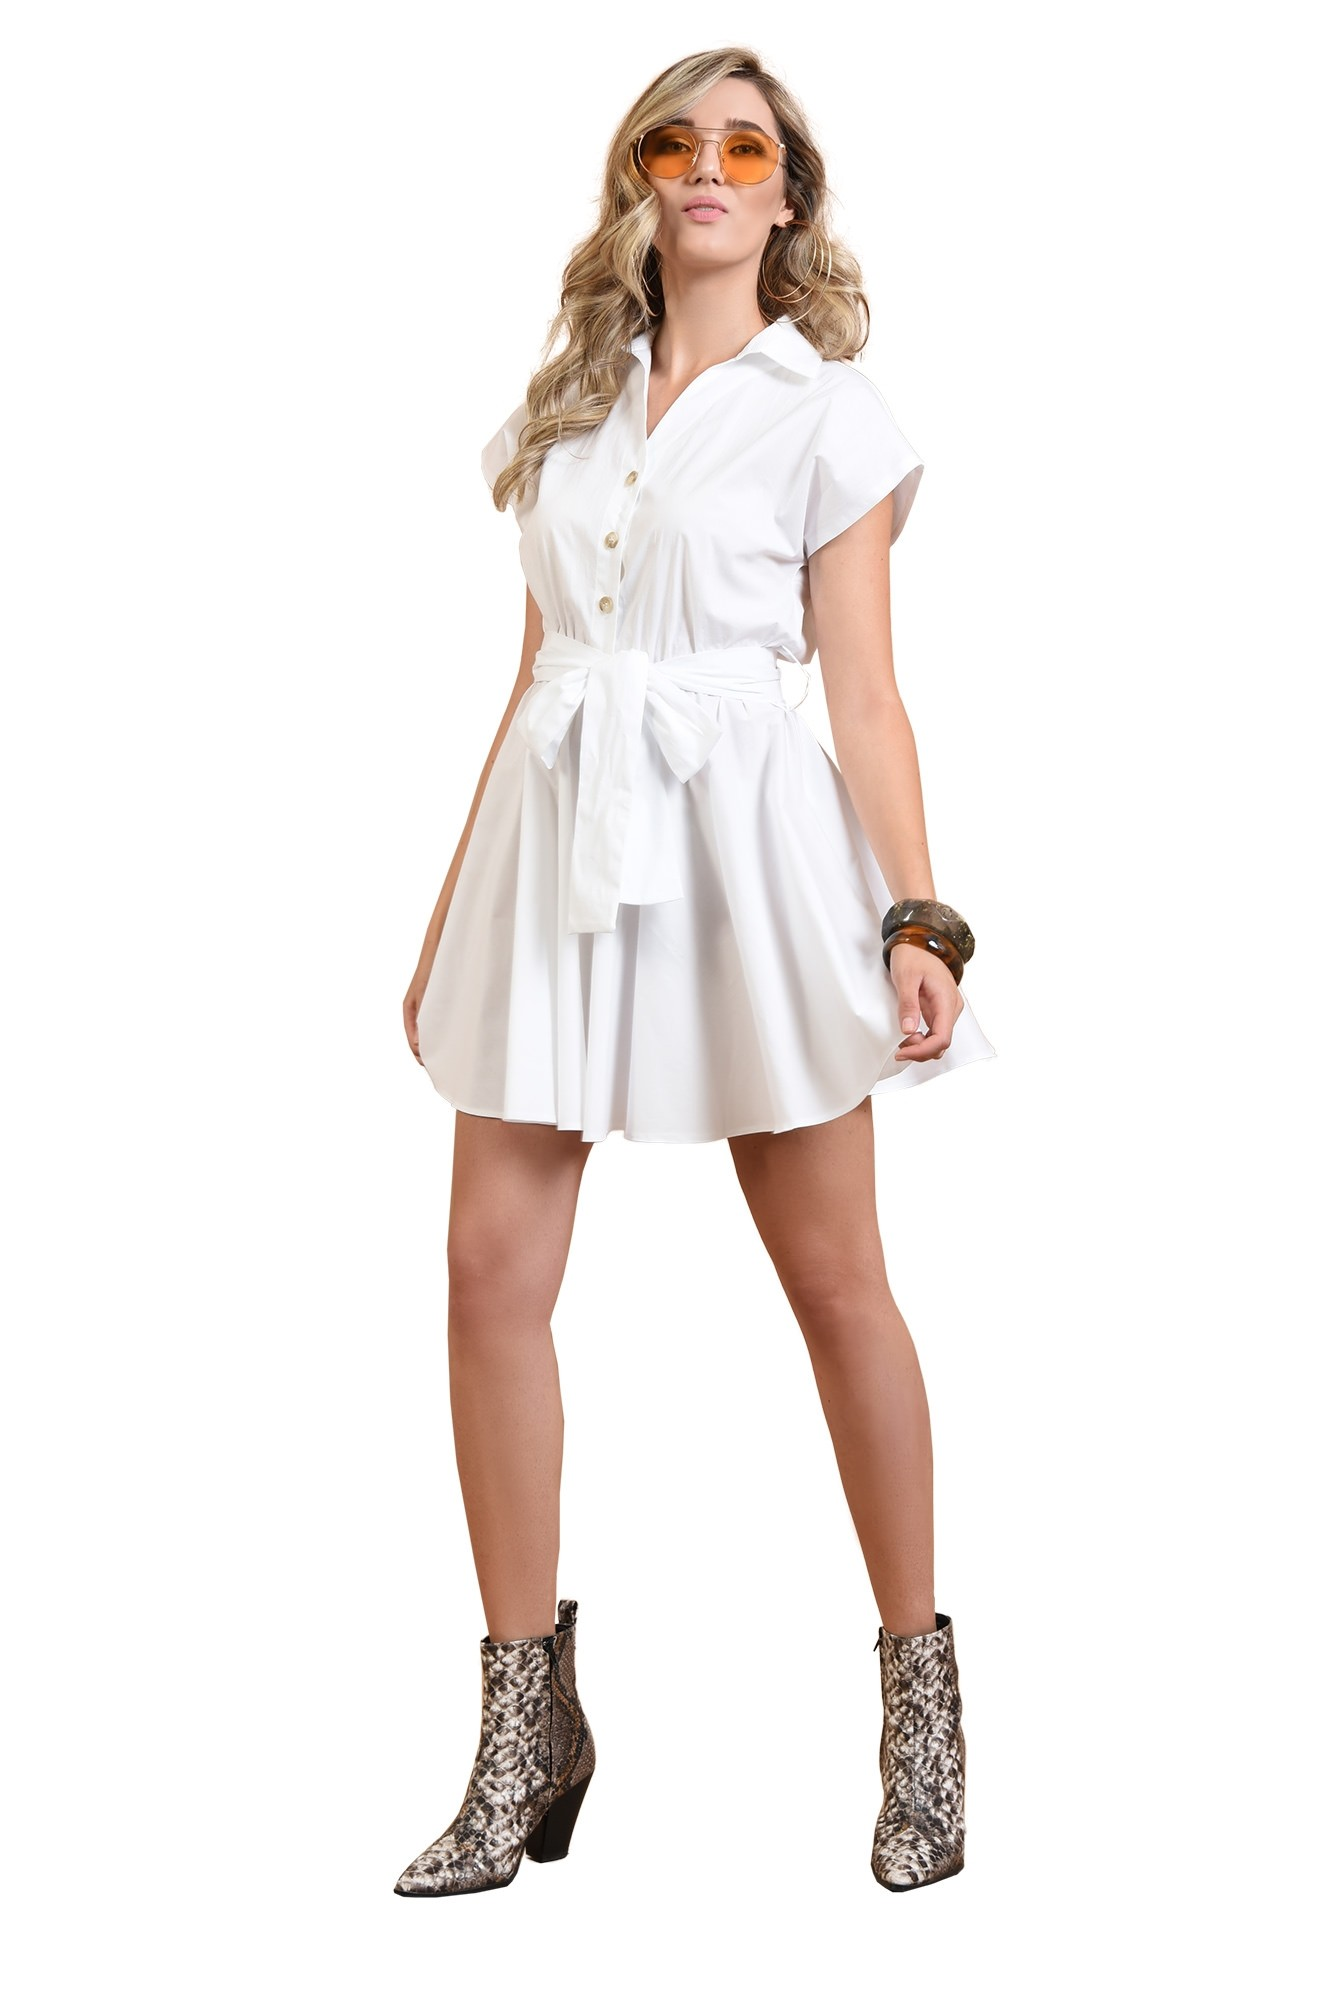 3 - 360 - rochie mini, evazata, fara maneci, cu cordon, alba